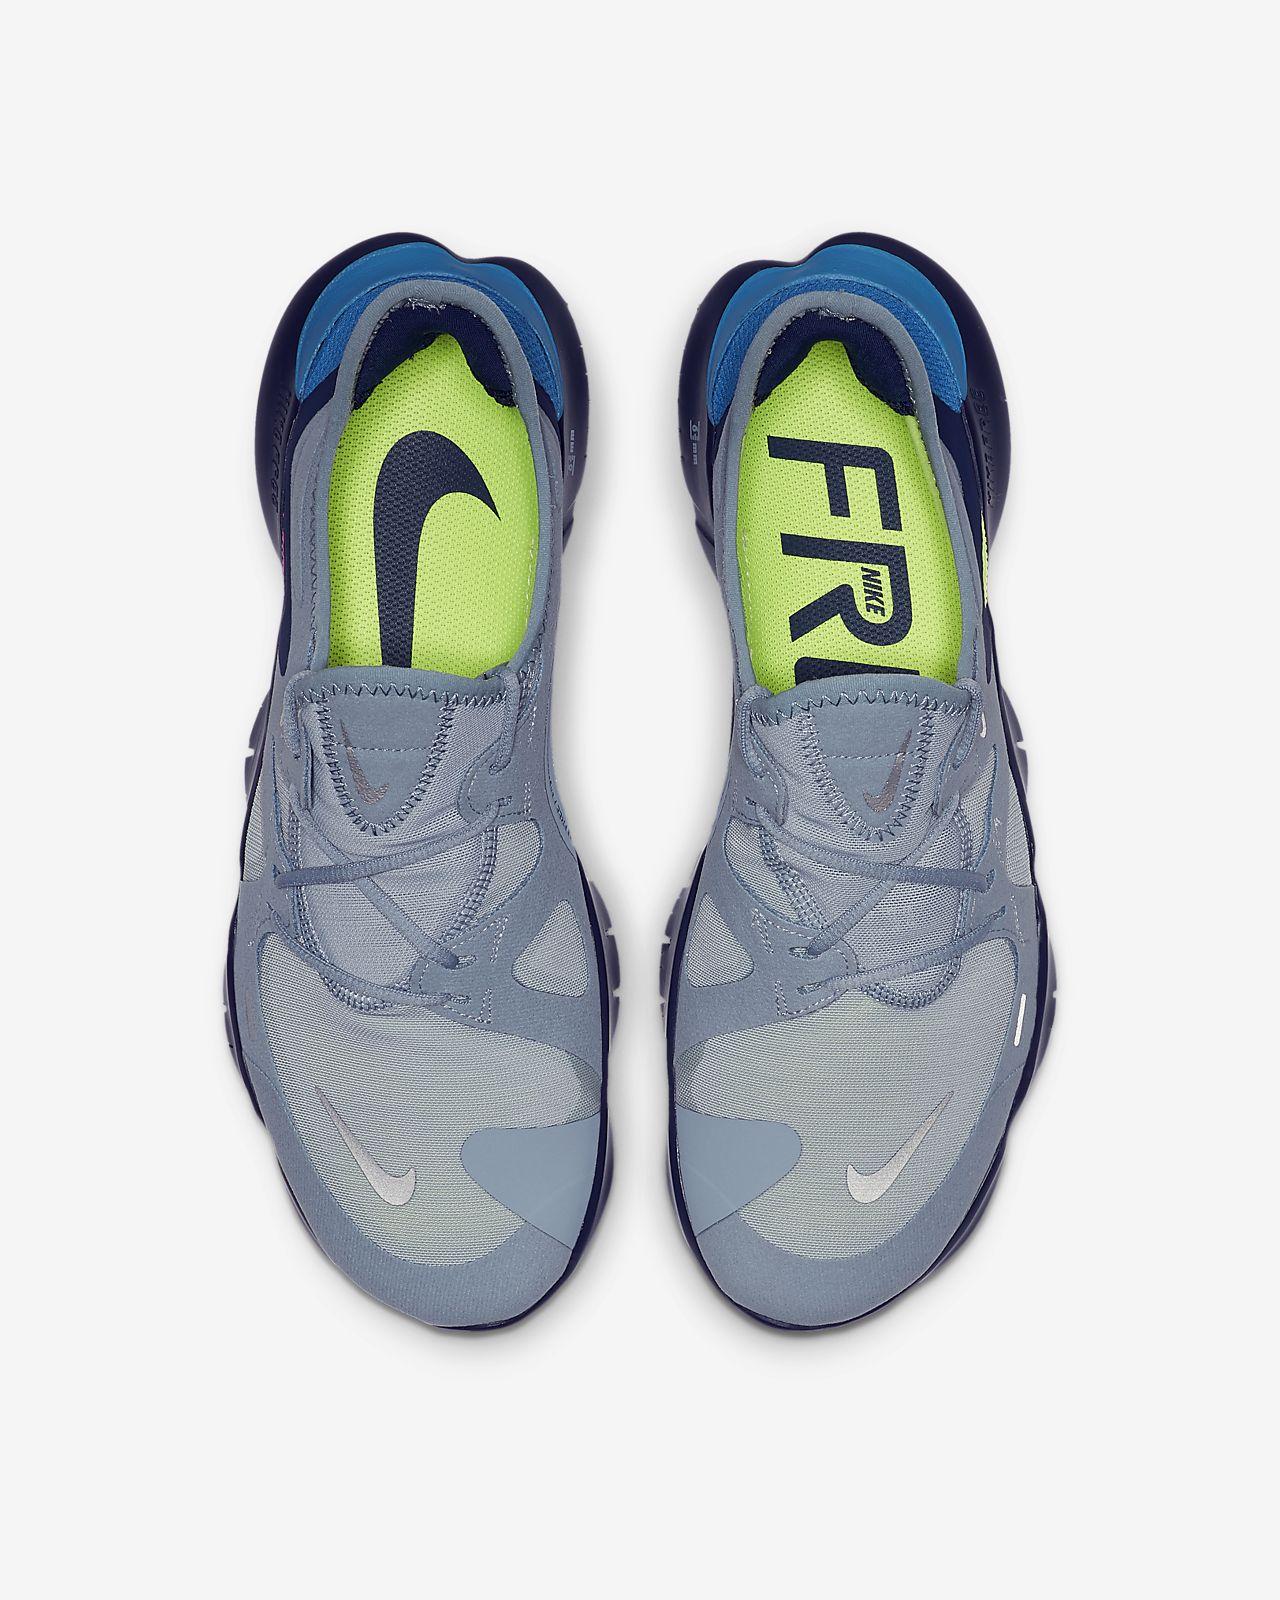 Nike Free RN 5.0 Men's Running Shoe luminous greensailpure platinumblack AQ1289 300